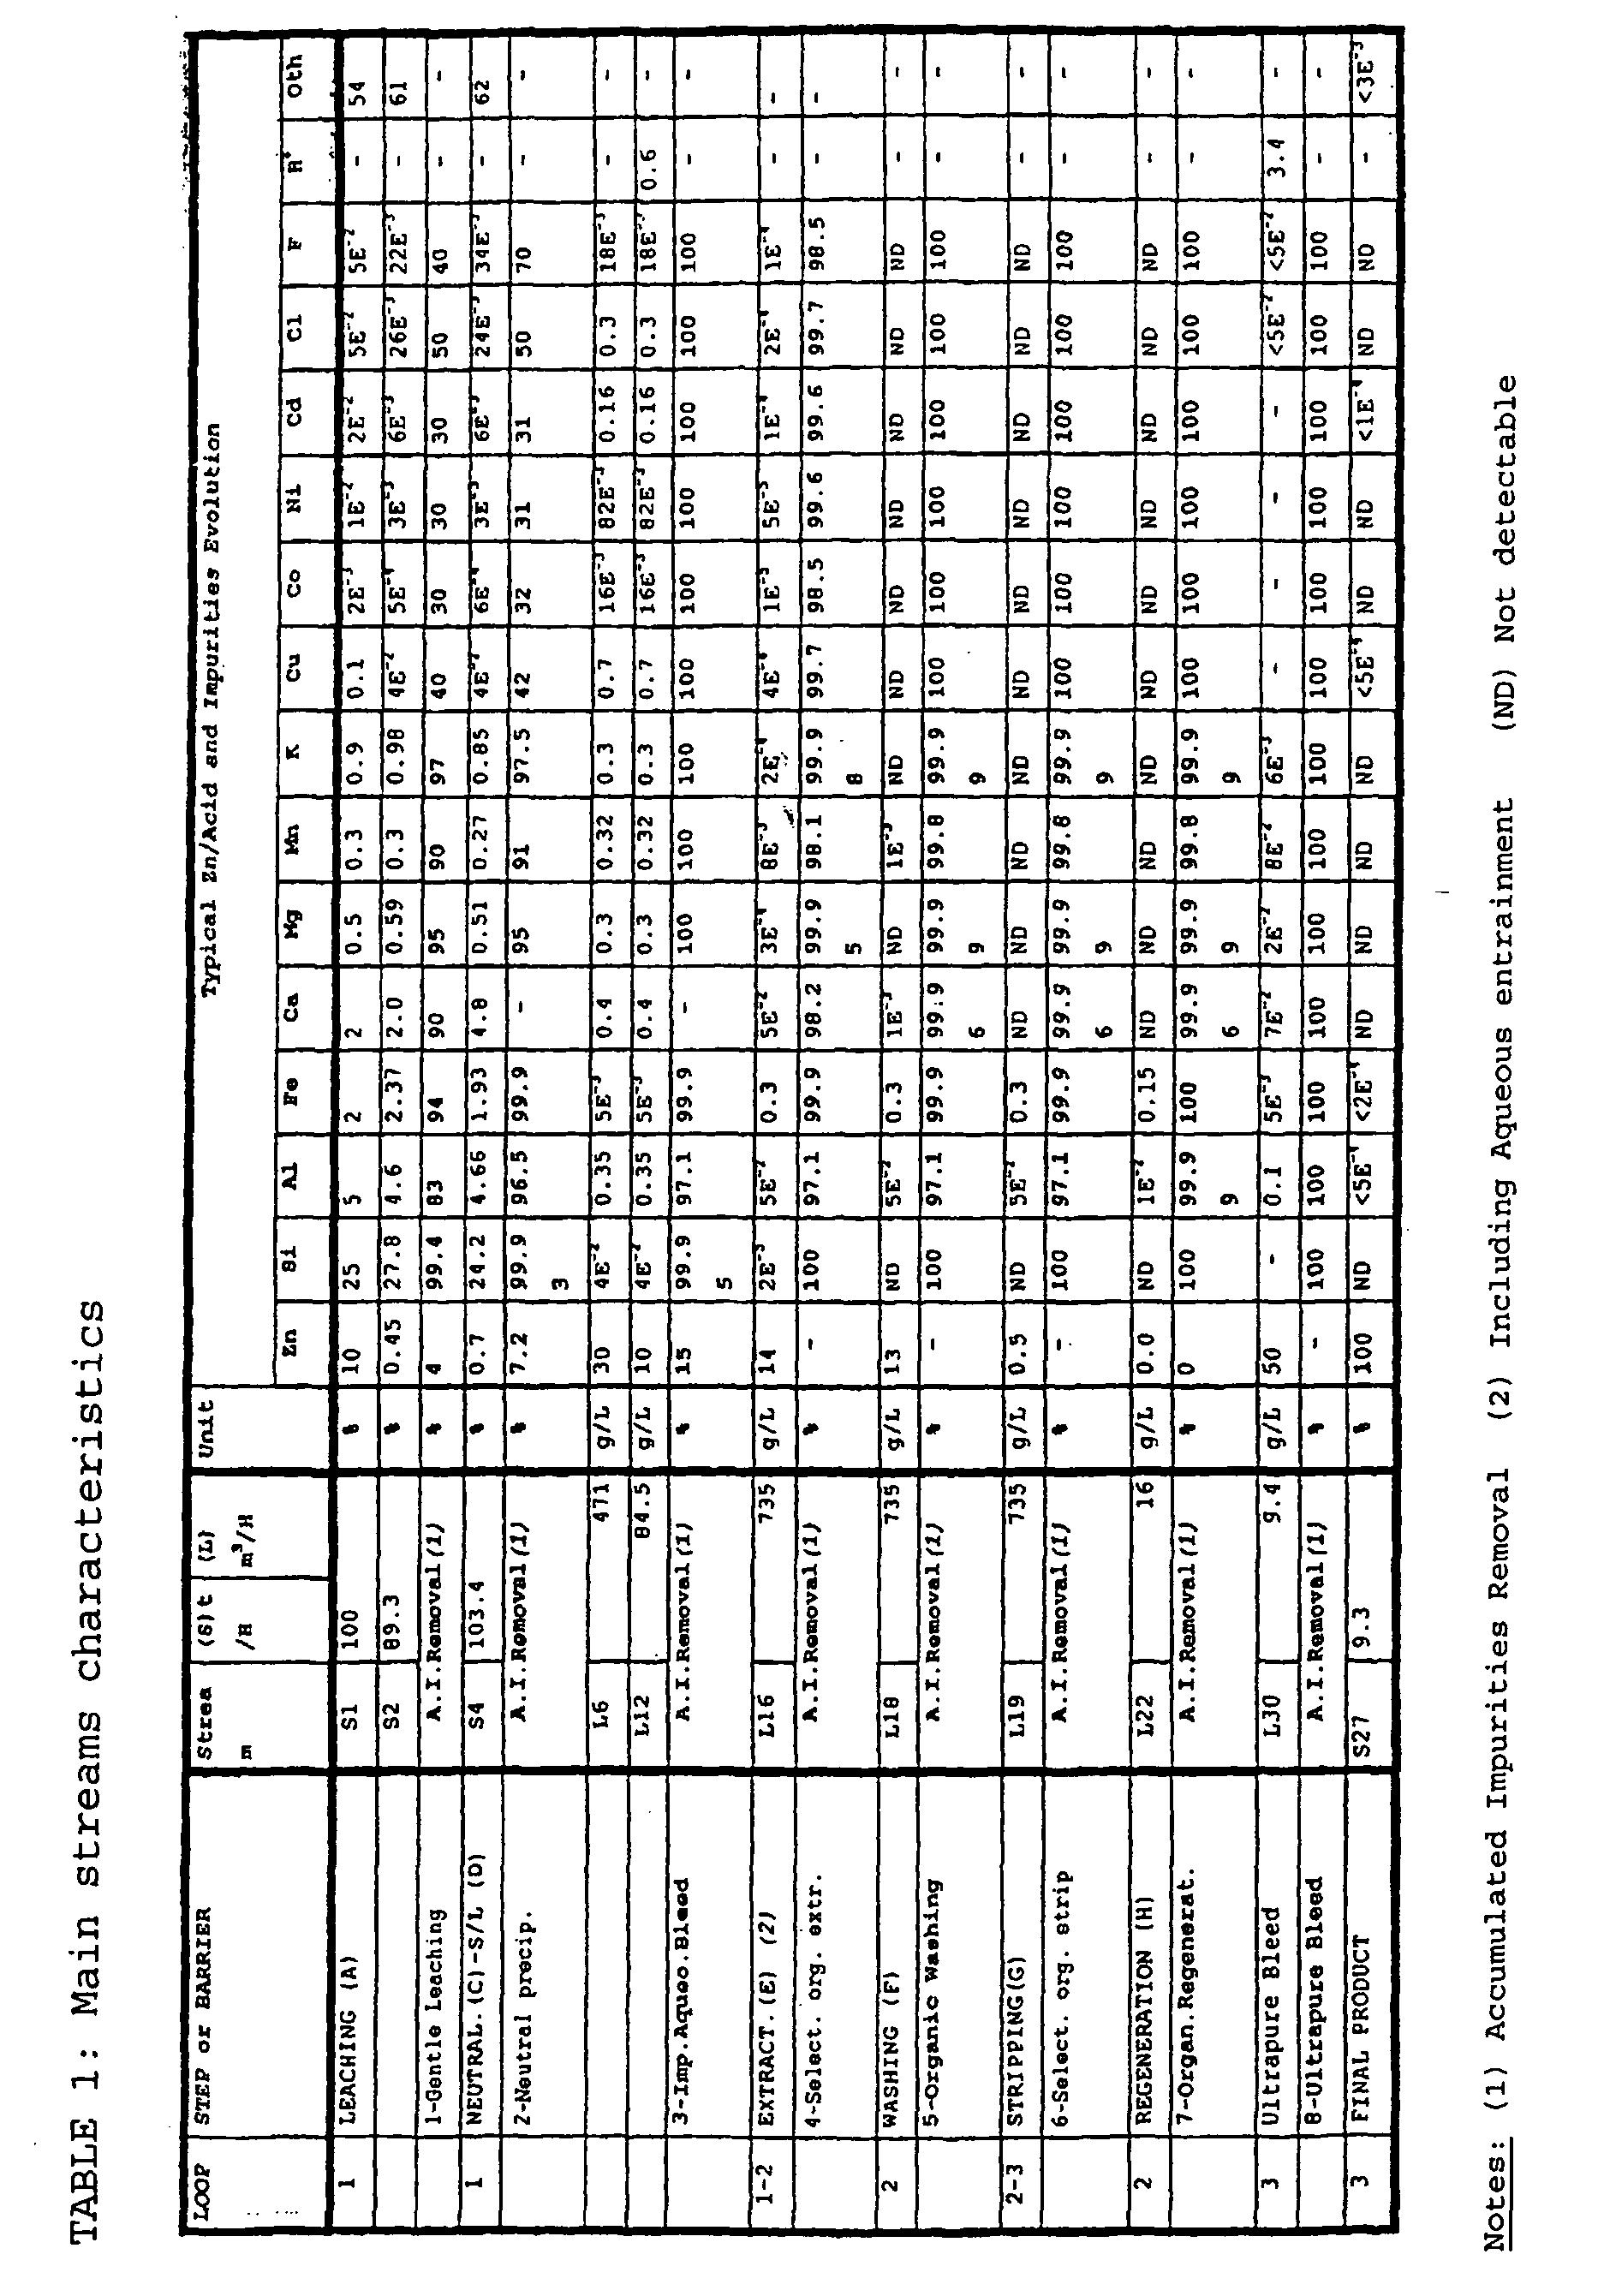 patent ep1361296b1